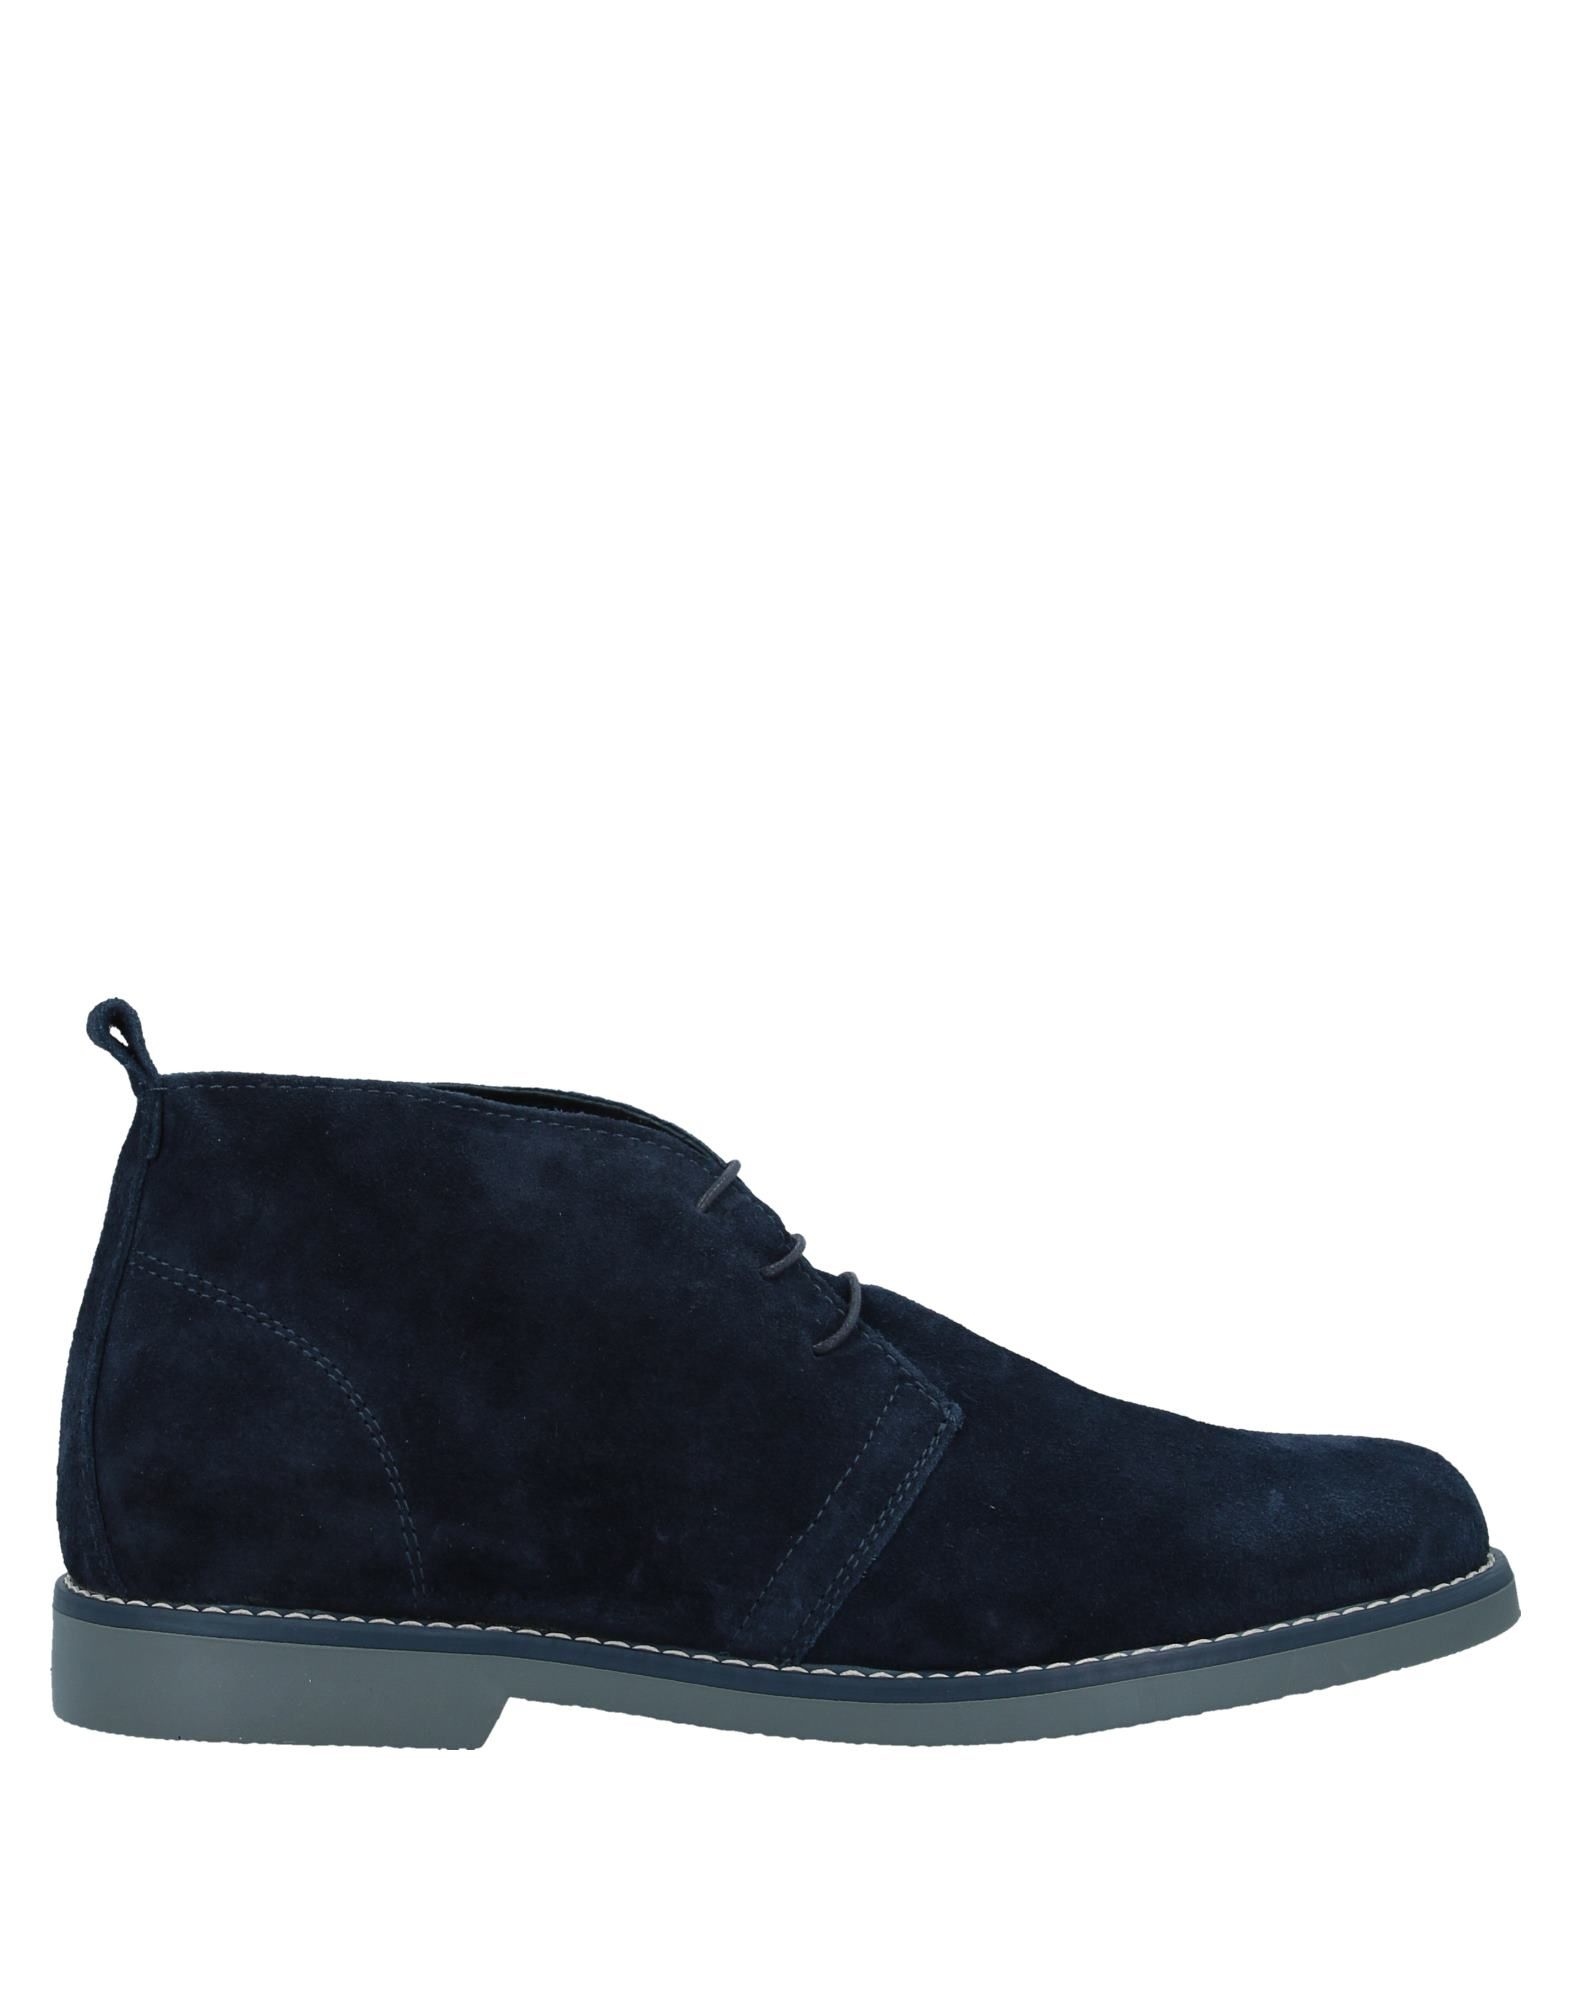 D. SCUDIERI Полусапоги и высокие ботинки